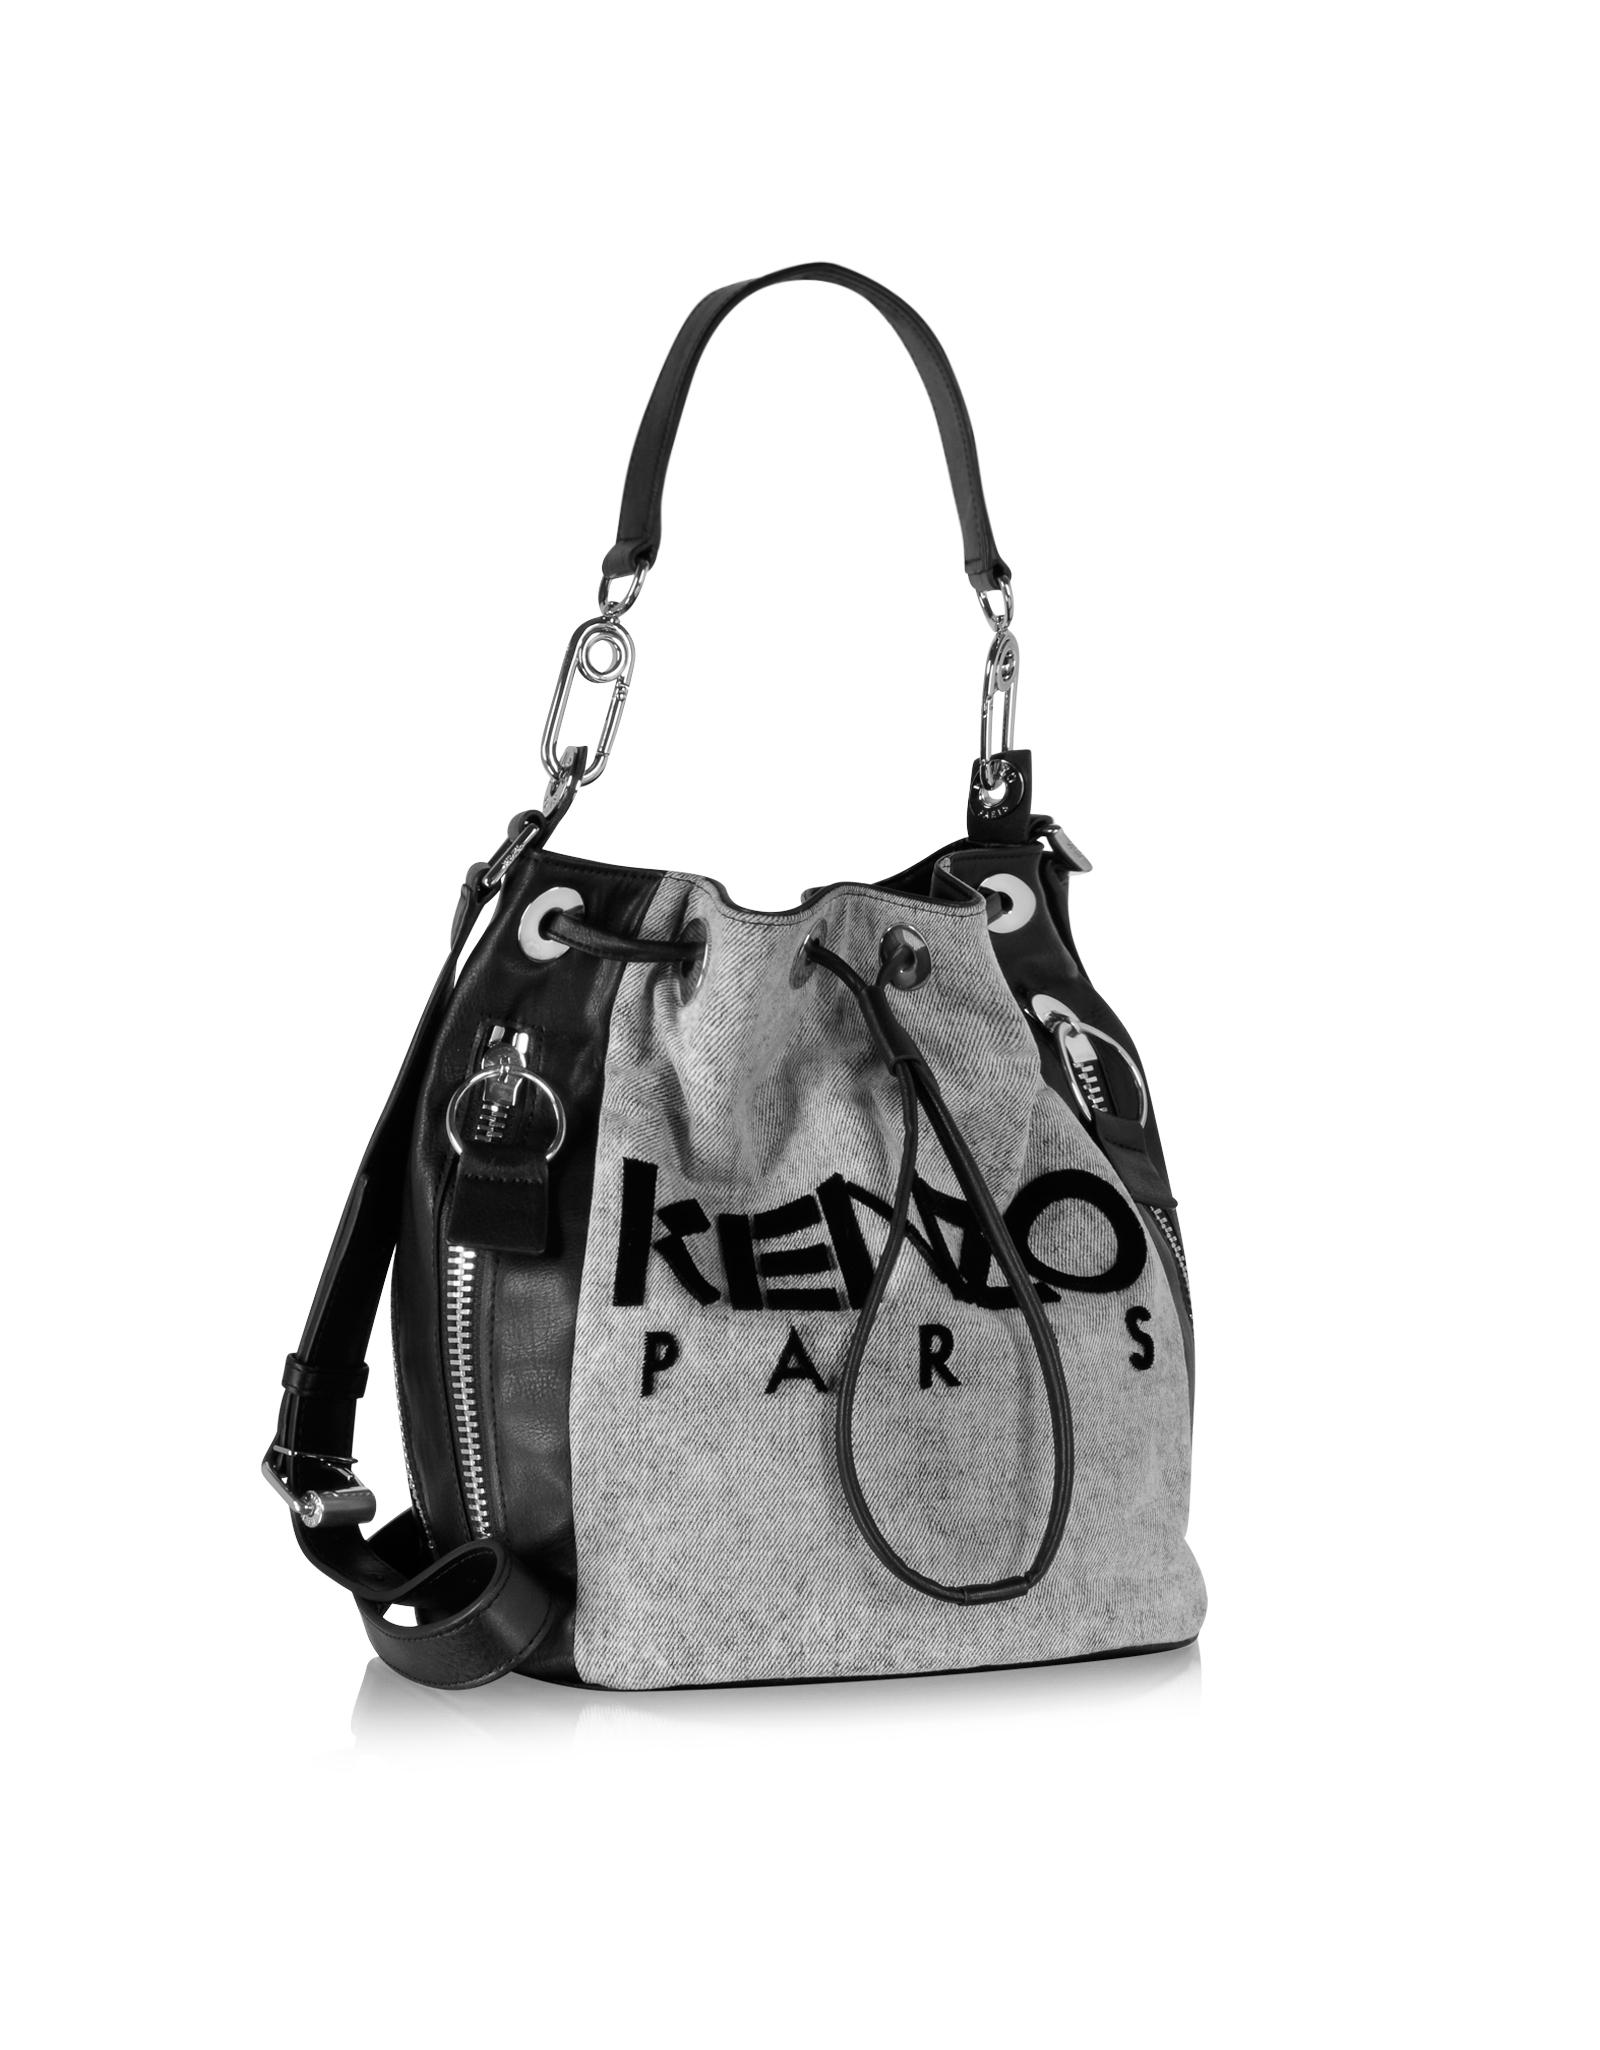 a875988558 KENZO Kanvas Bucket Bag in Black - Lyst